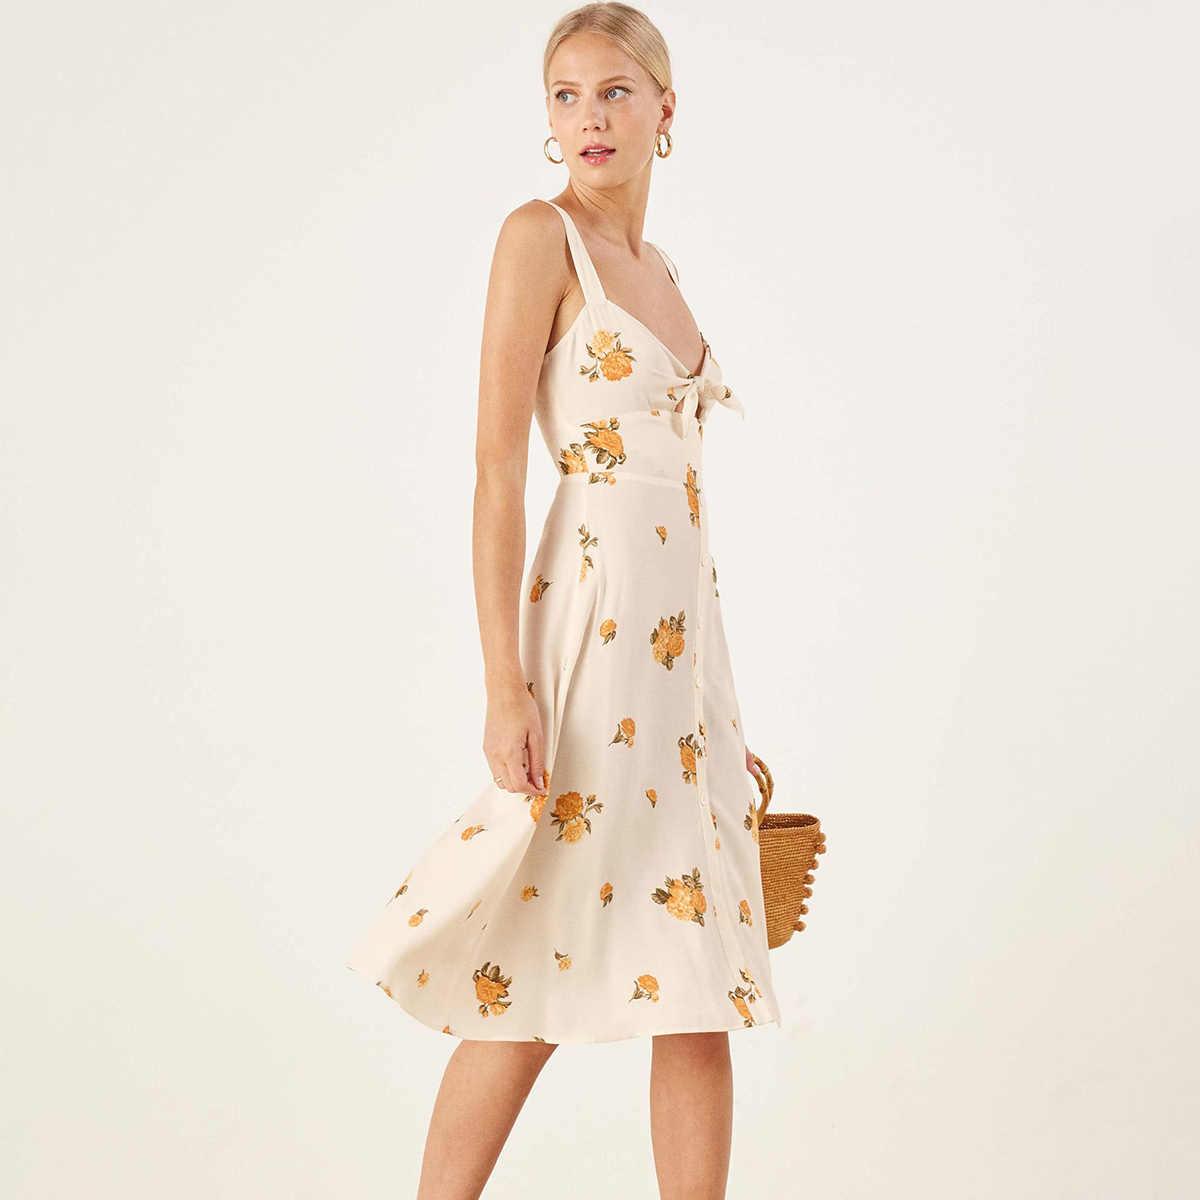 f2efc6a488990 Floral Print Midi Dress Women Frankfort Sweetheart Bow Strap Button-Up Sexy  Dress 2019 Summer Ladies Elegant Party Club Dress